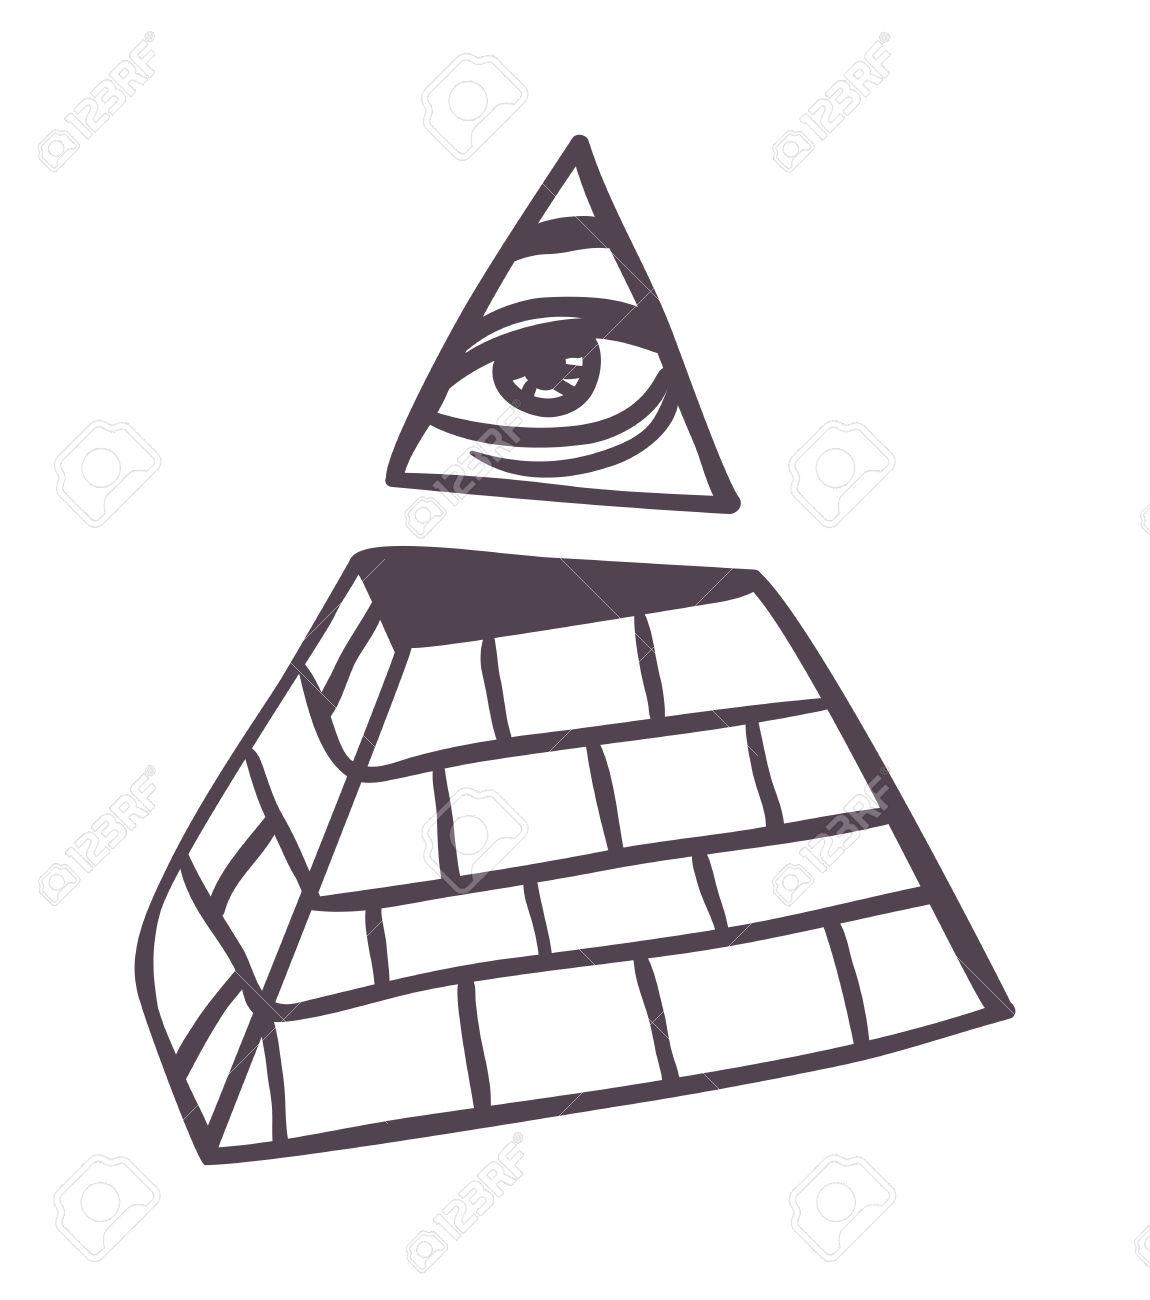 1150x1300 Pyramid Clipart Silhouette